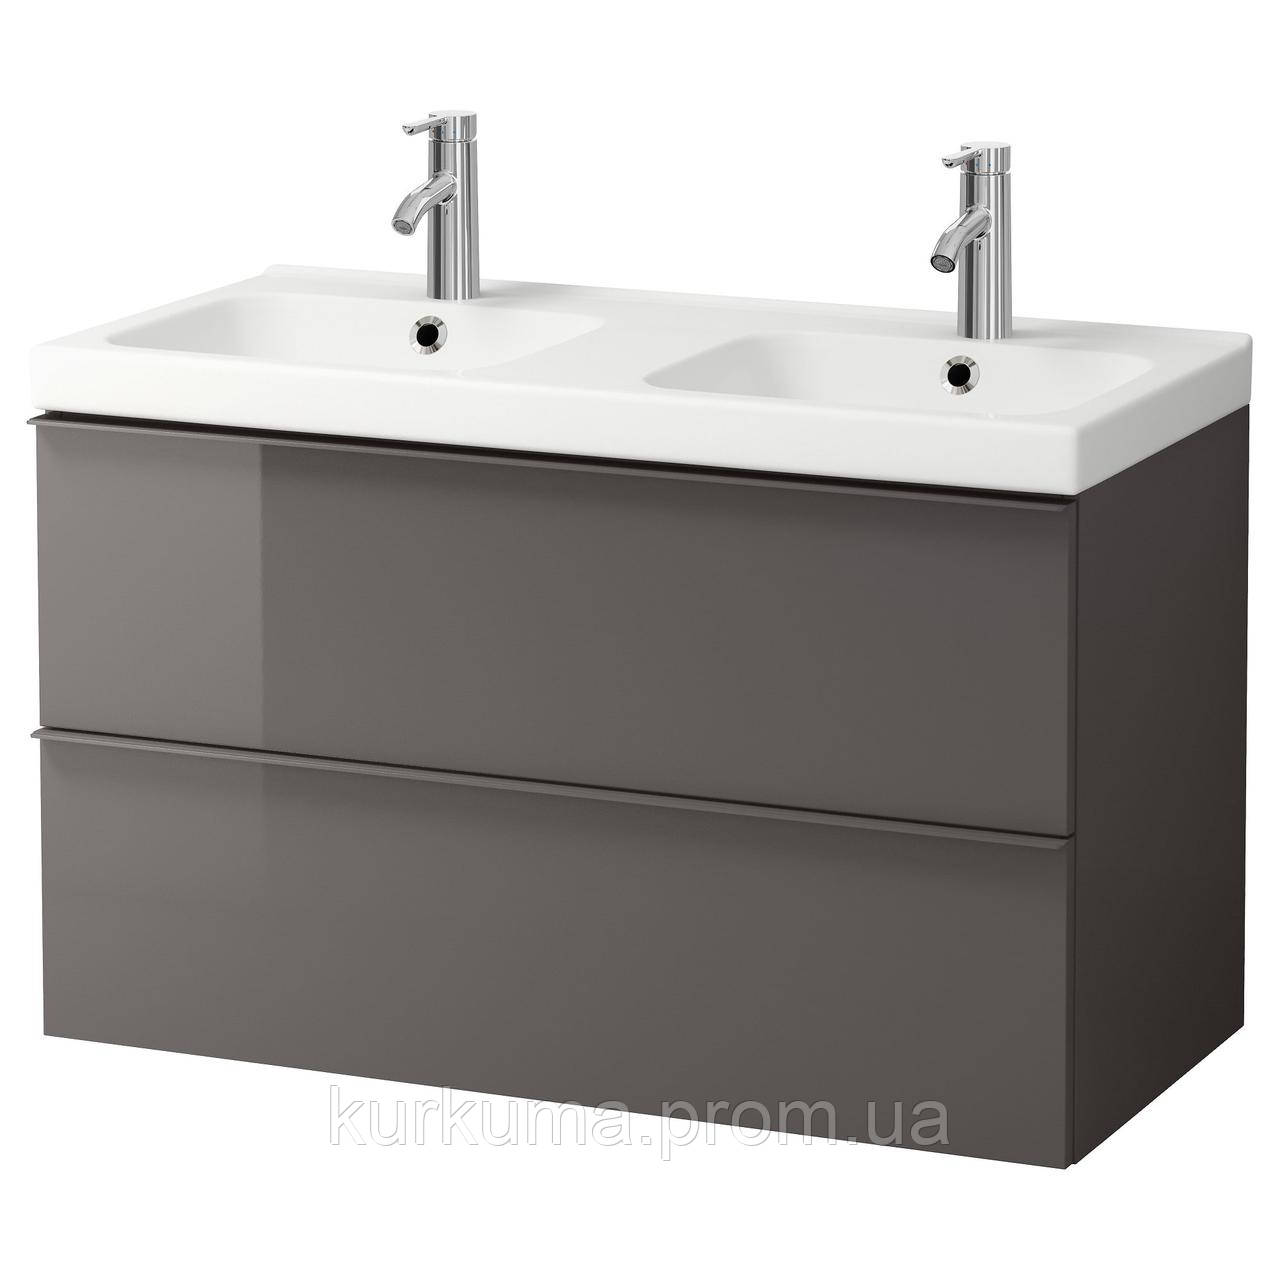 IKEA GODMORGON/ODENSVIK Шкаф под умывальник с раковиной, глянцевый серый  (091.858.48)